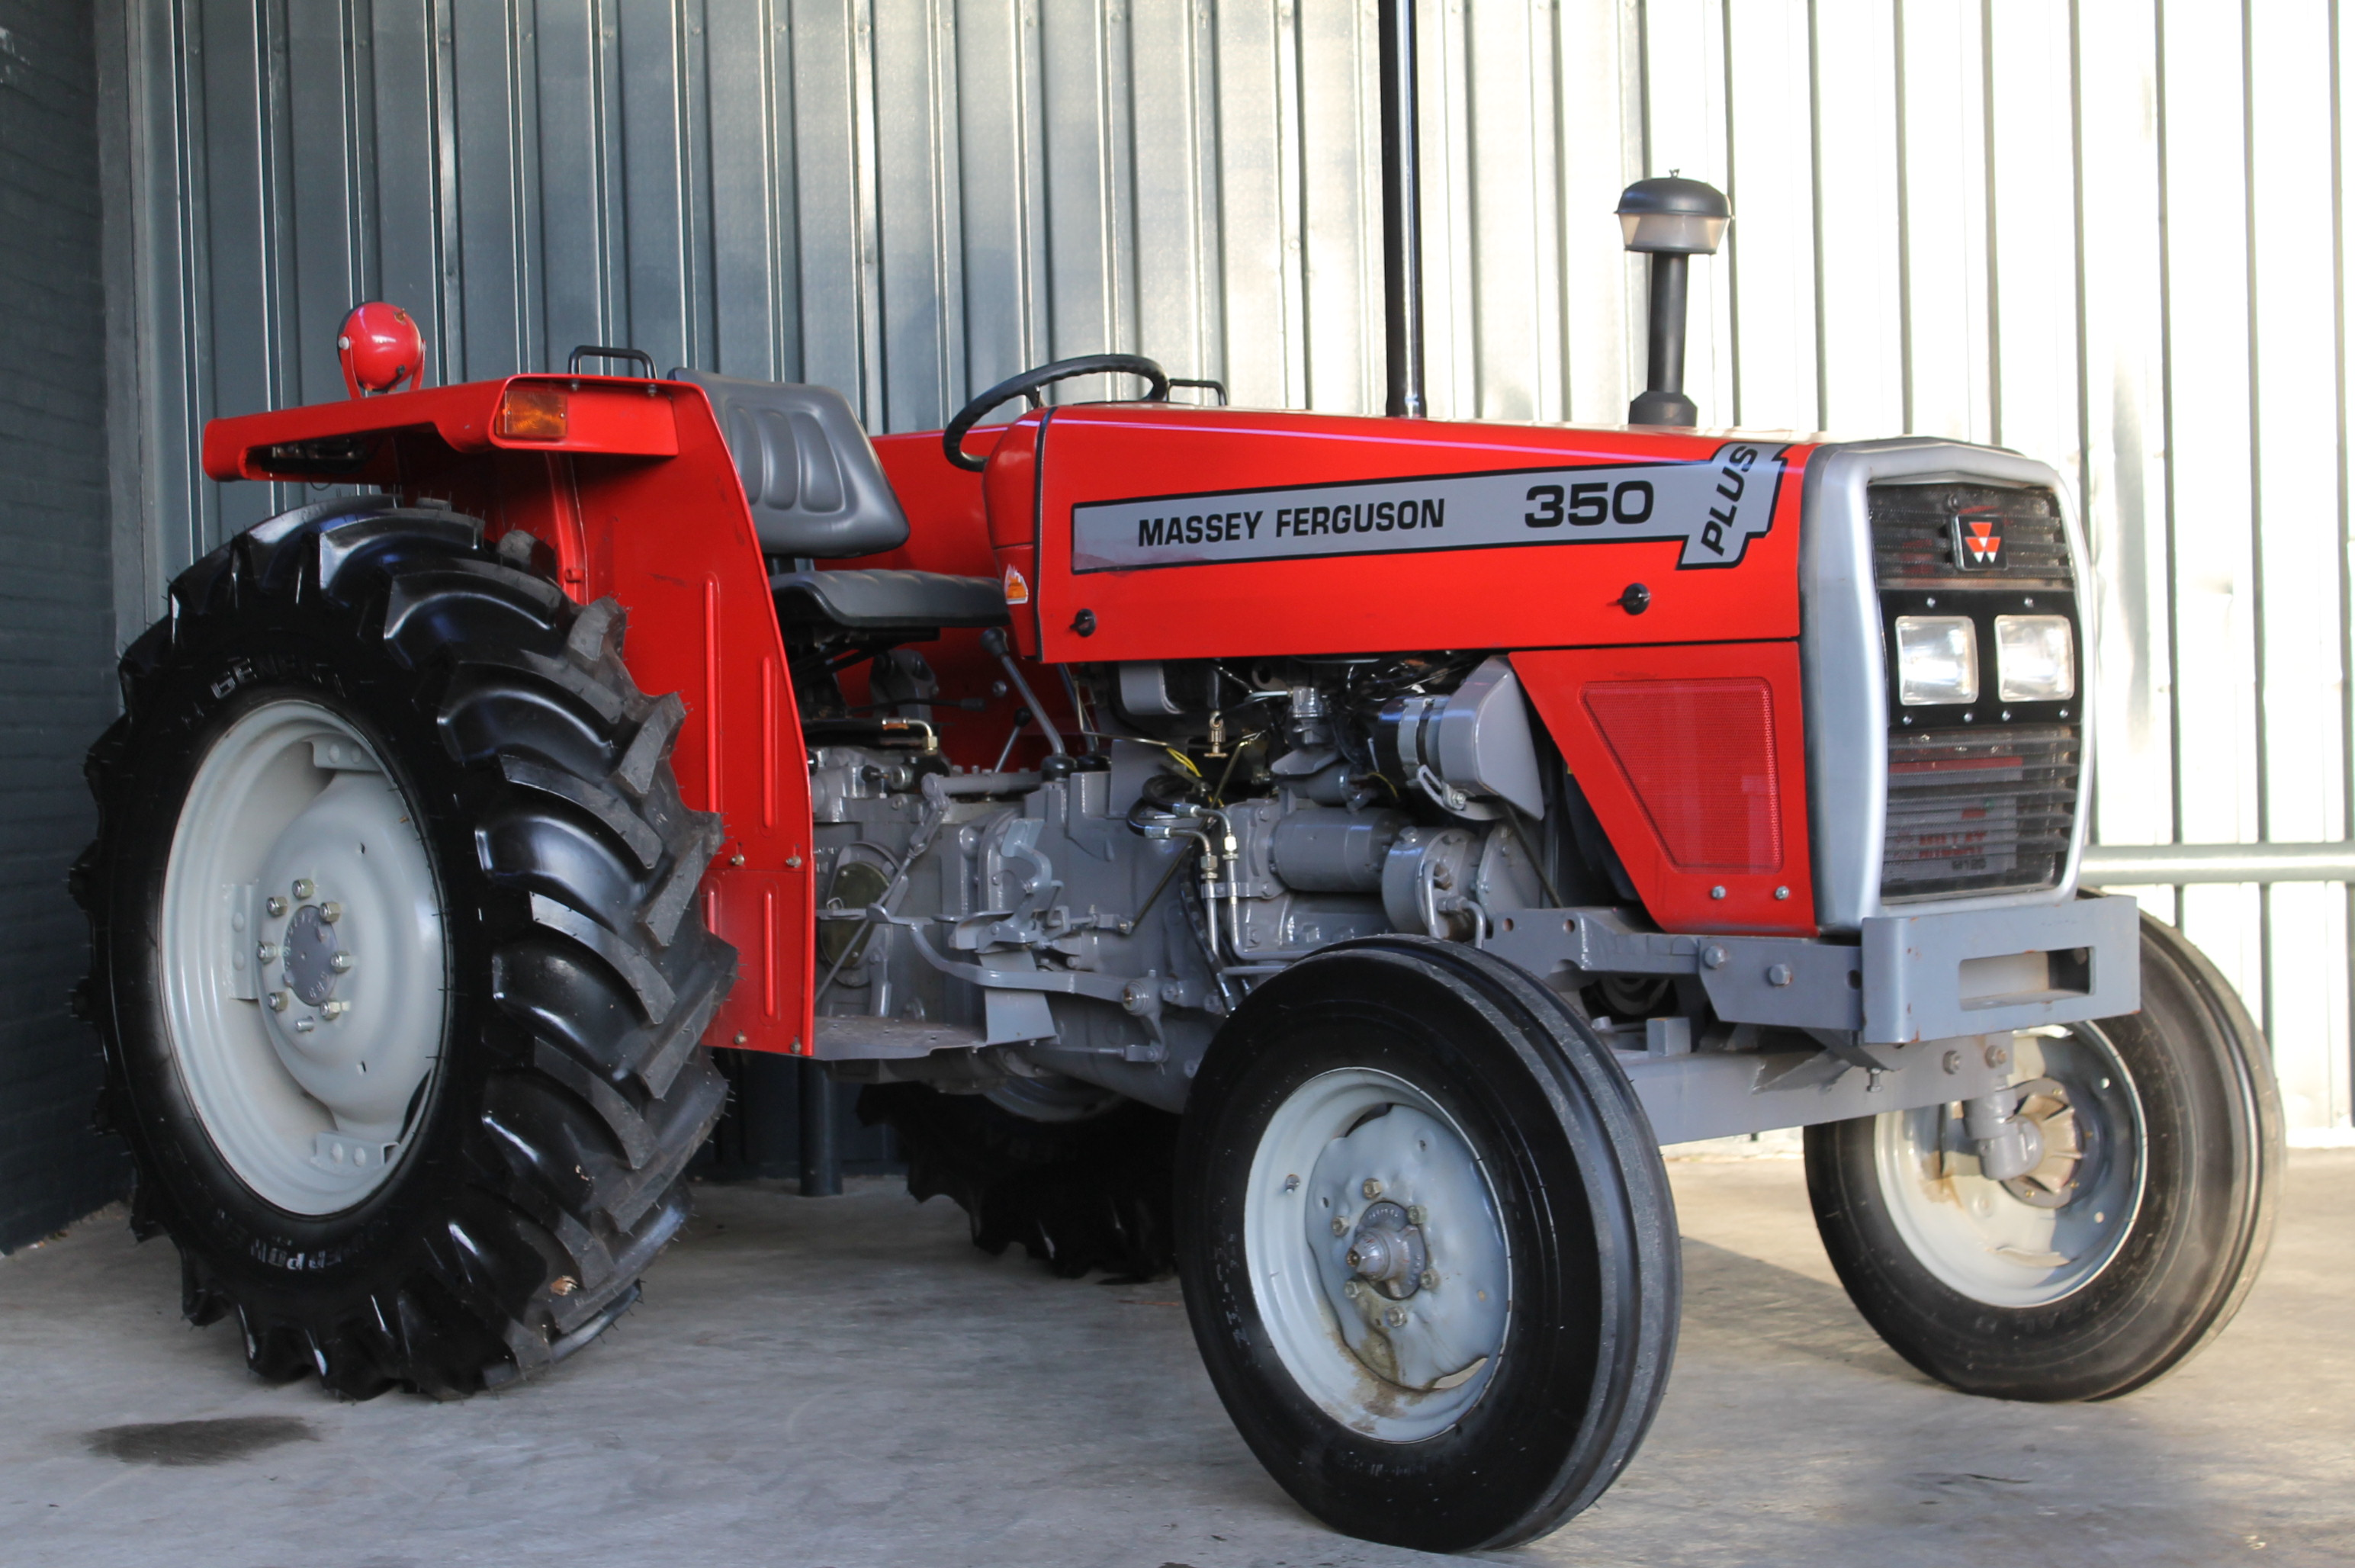 Massey-Ferguson 350 2wd